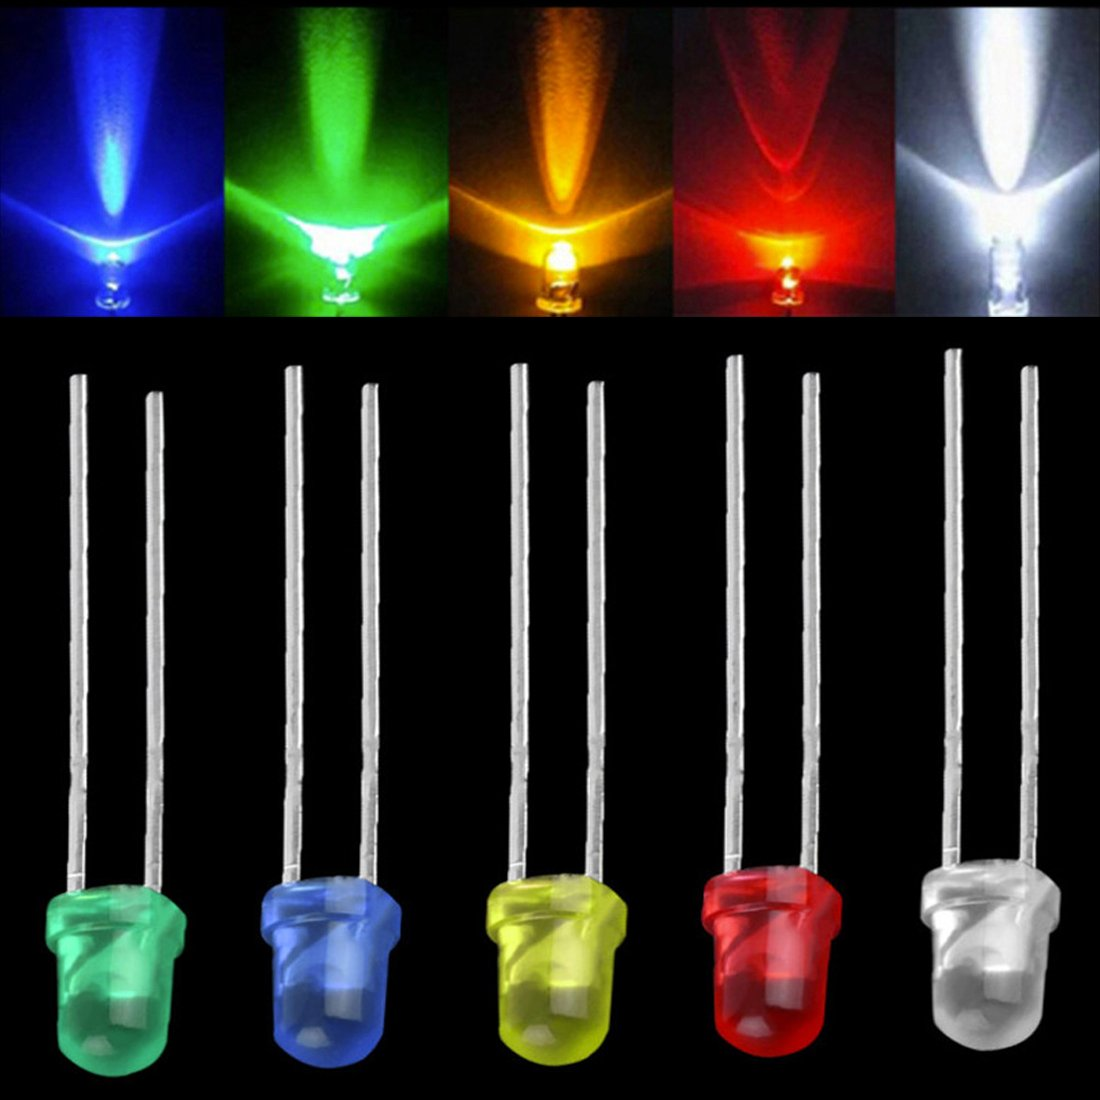 3/mm 5/colori LED diodi lampada testa rotonda 100pcs 200OHM resistori inclusi 5/colori x 150PCS colori assortiti Milky Light Waycreat 750PCS